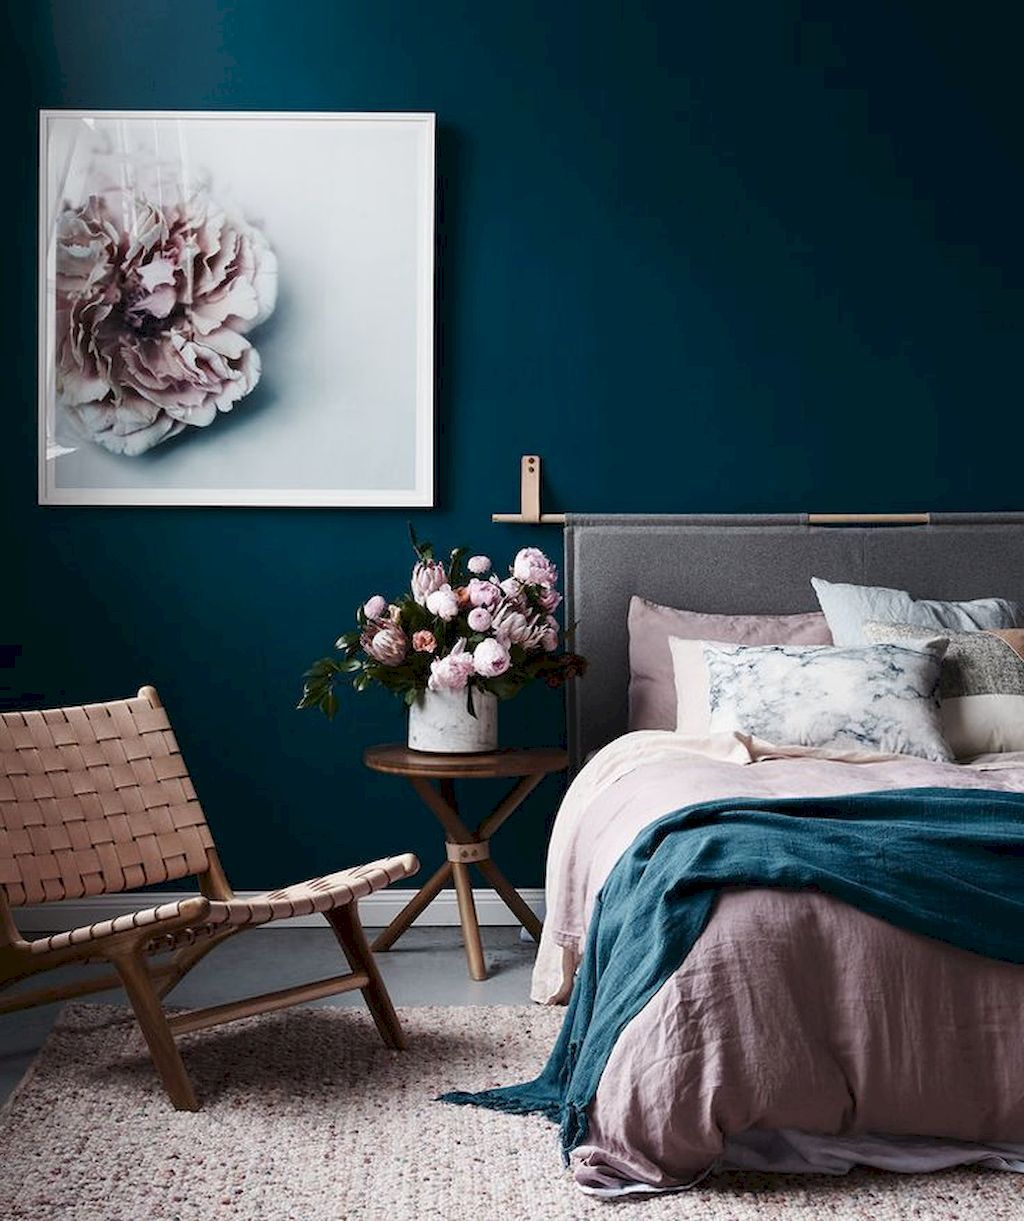 Master bedroom bedroom decor ideas  Beautiful master bedroom decorating ideas   Master bedroom